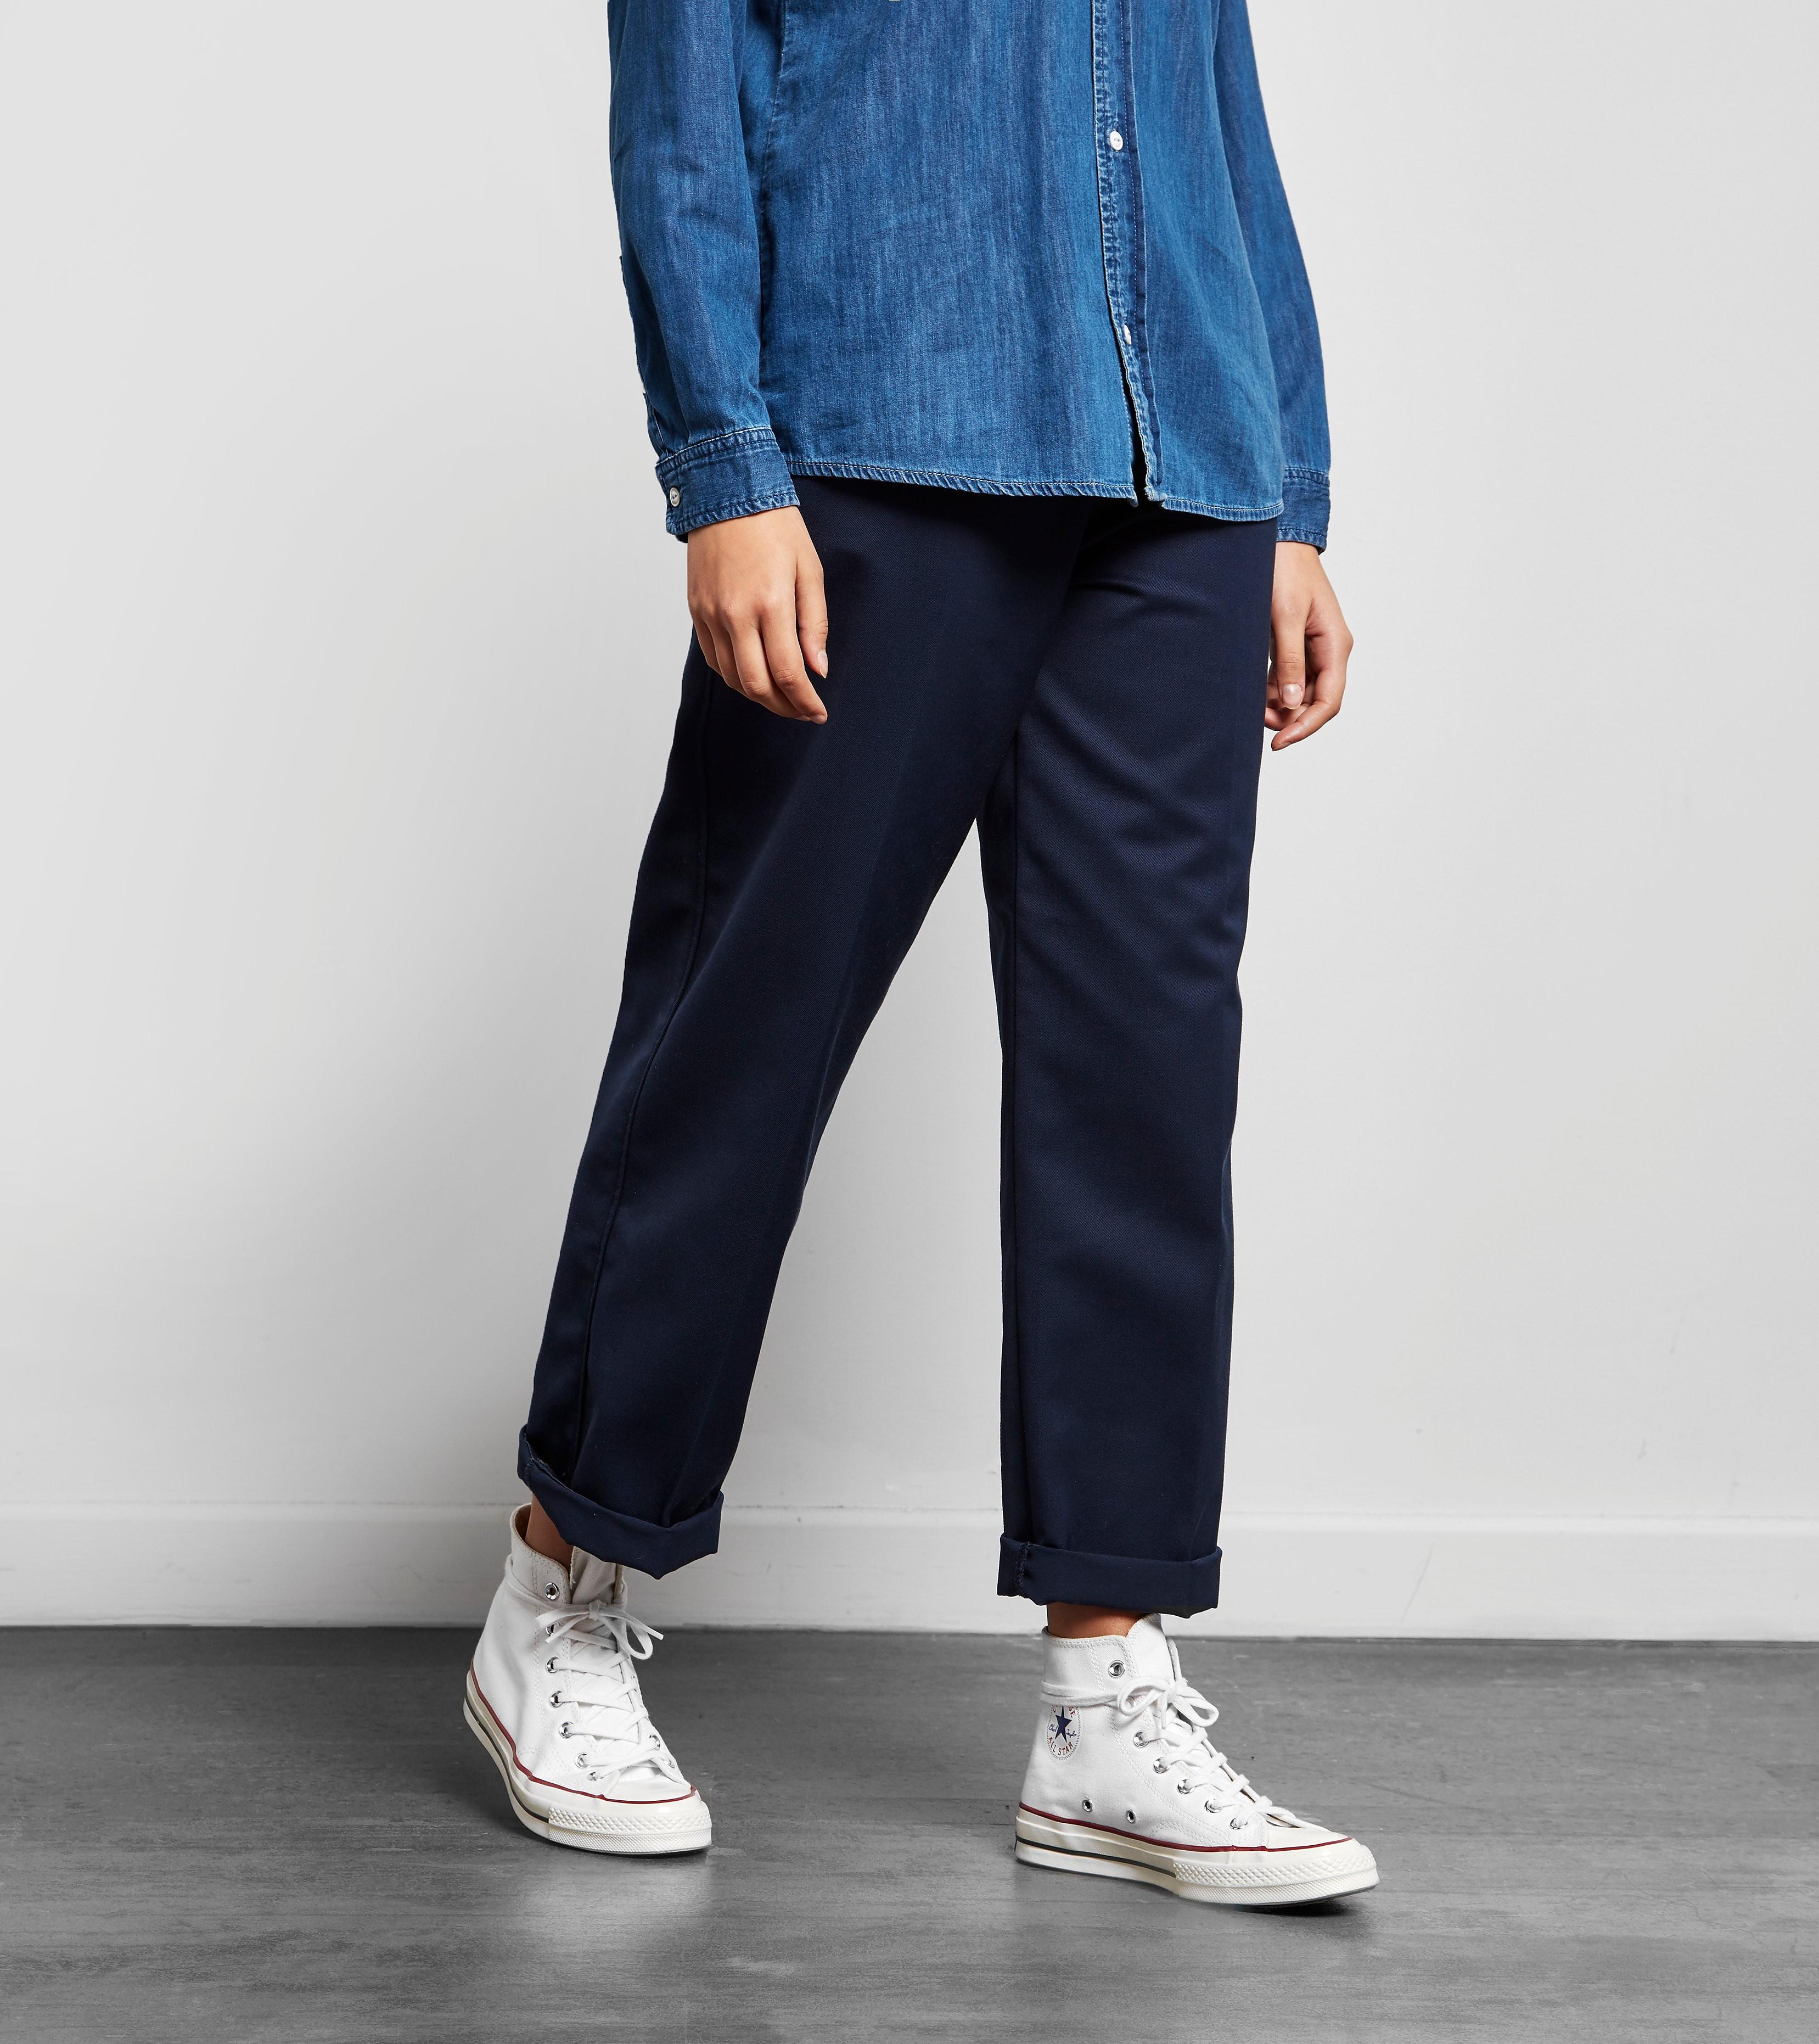 Carhartt WIP Packard Pants